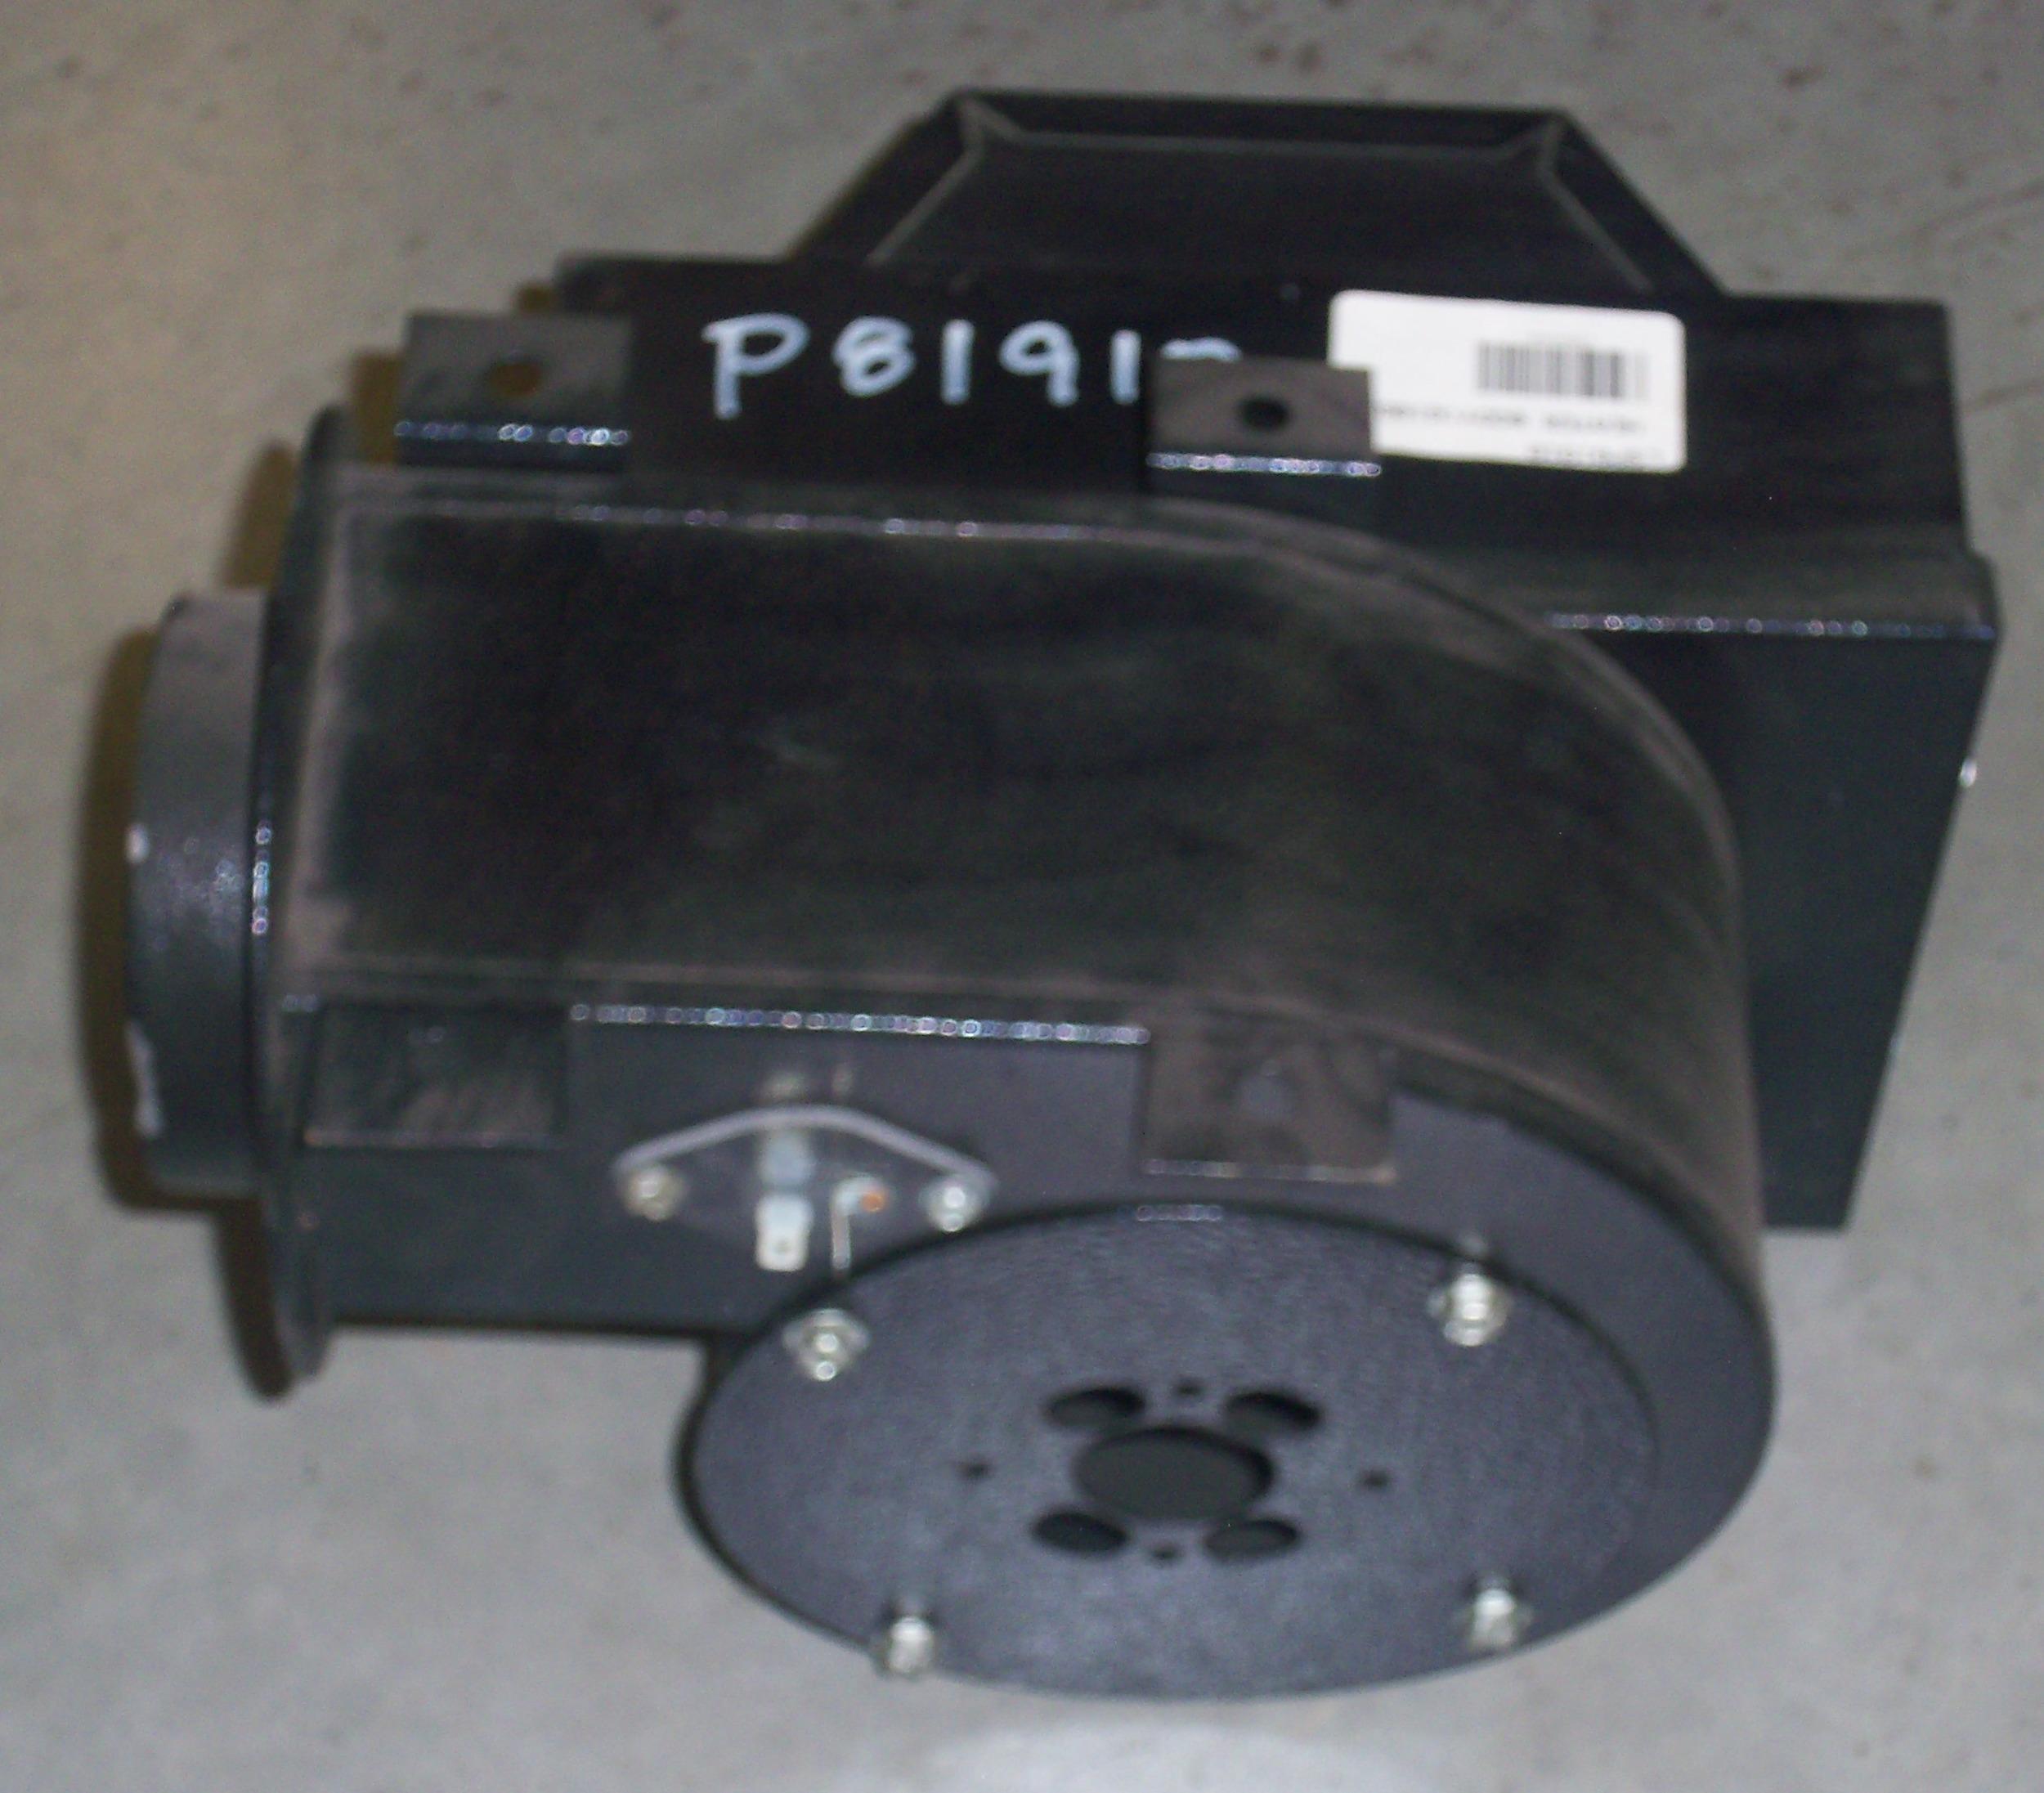 P81910-2.jpg